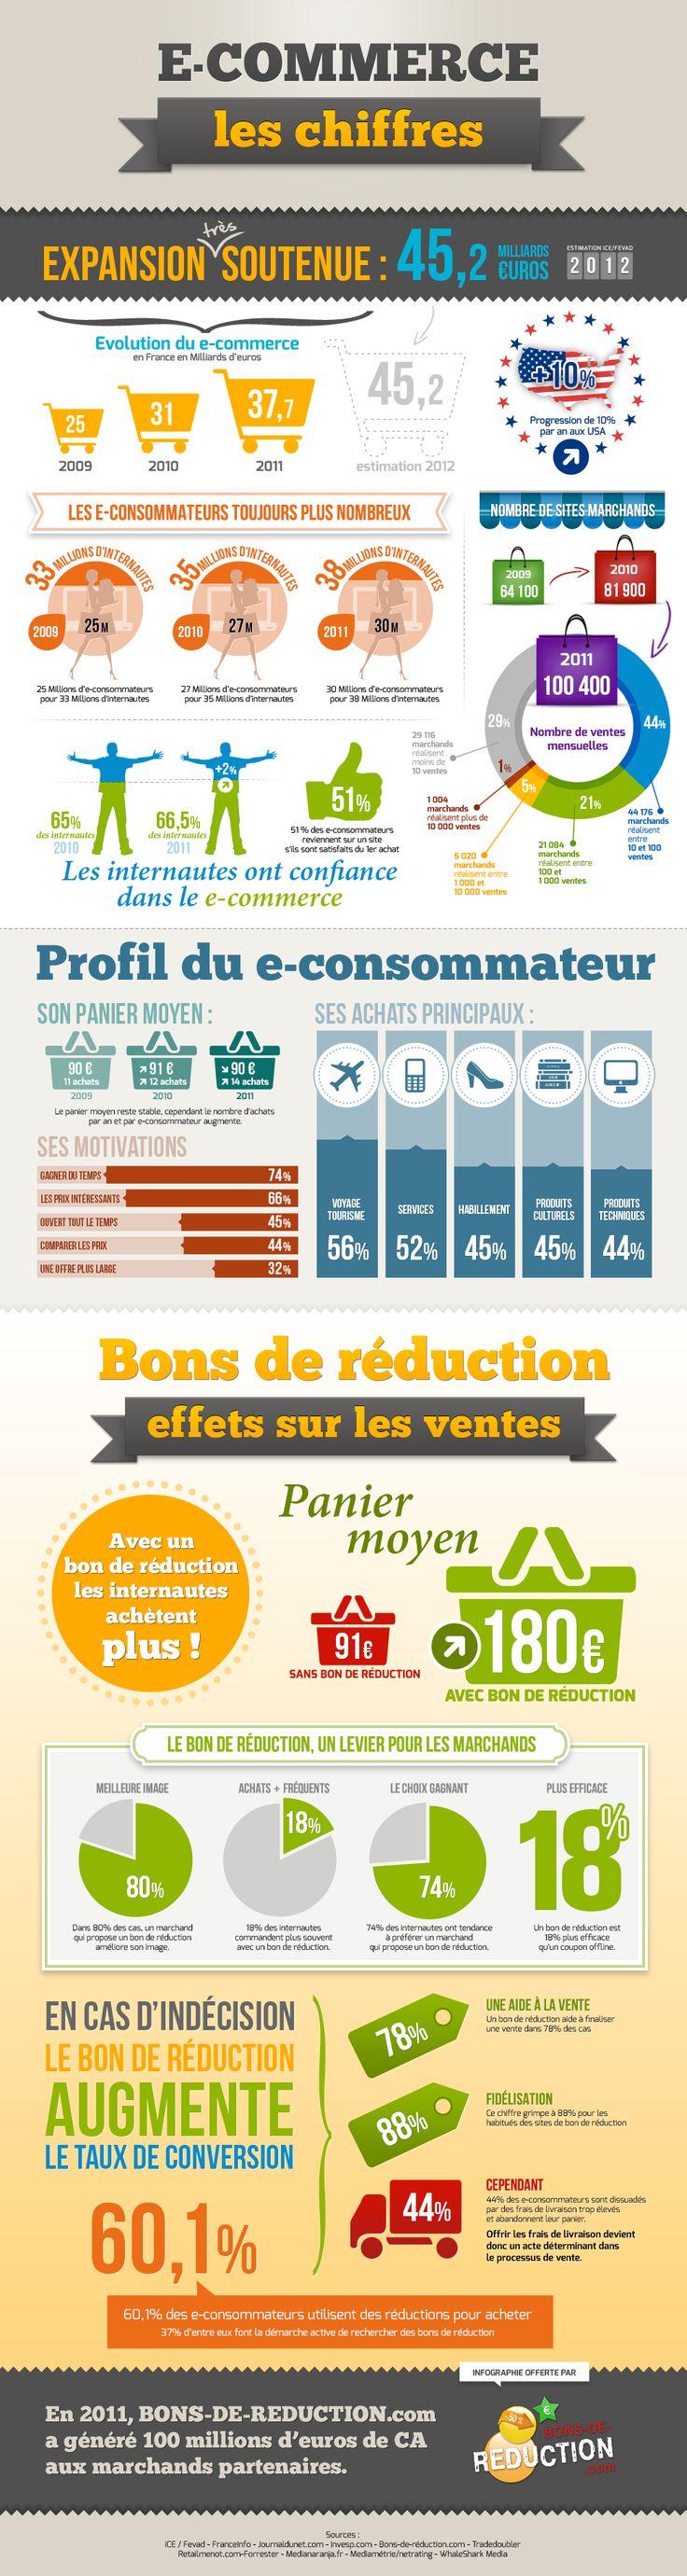 L'e-commerce en France